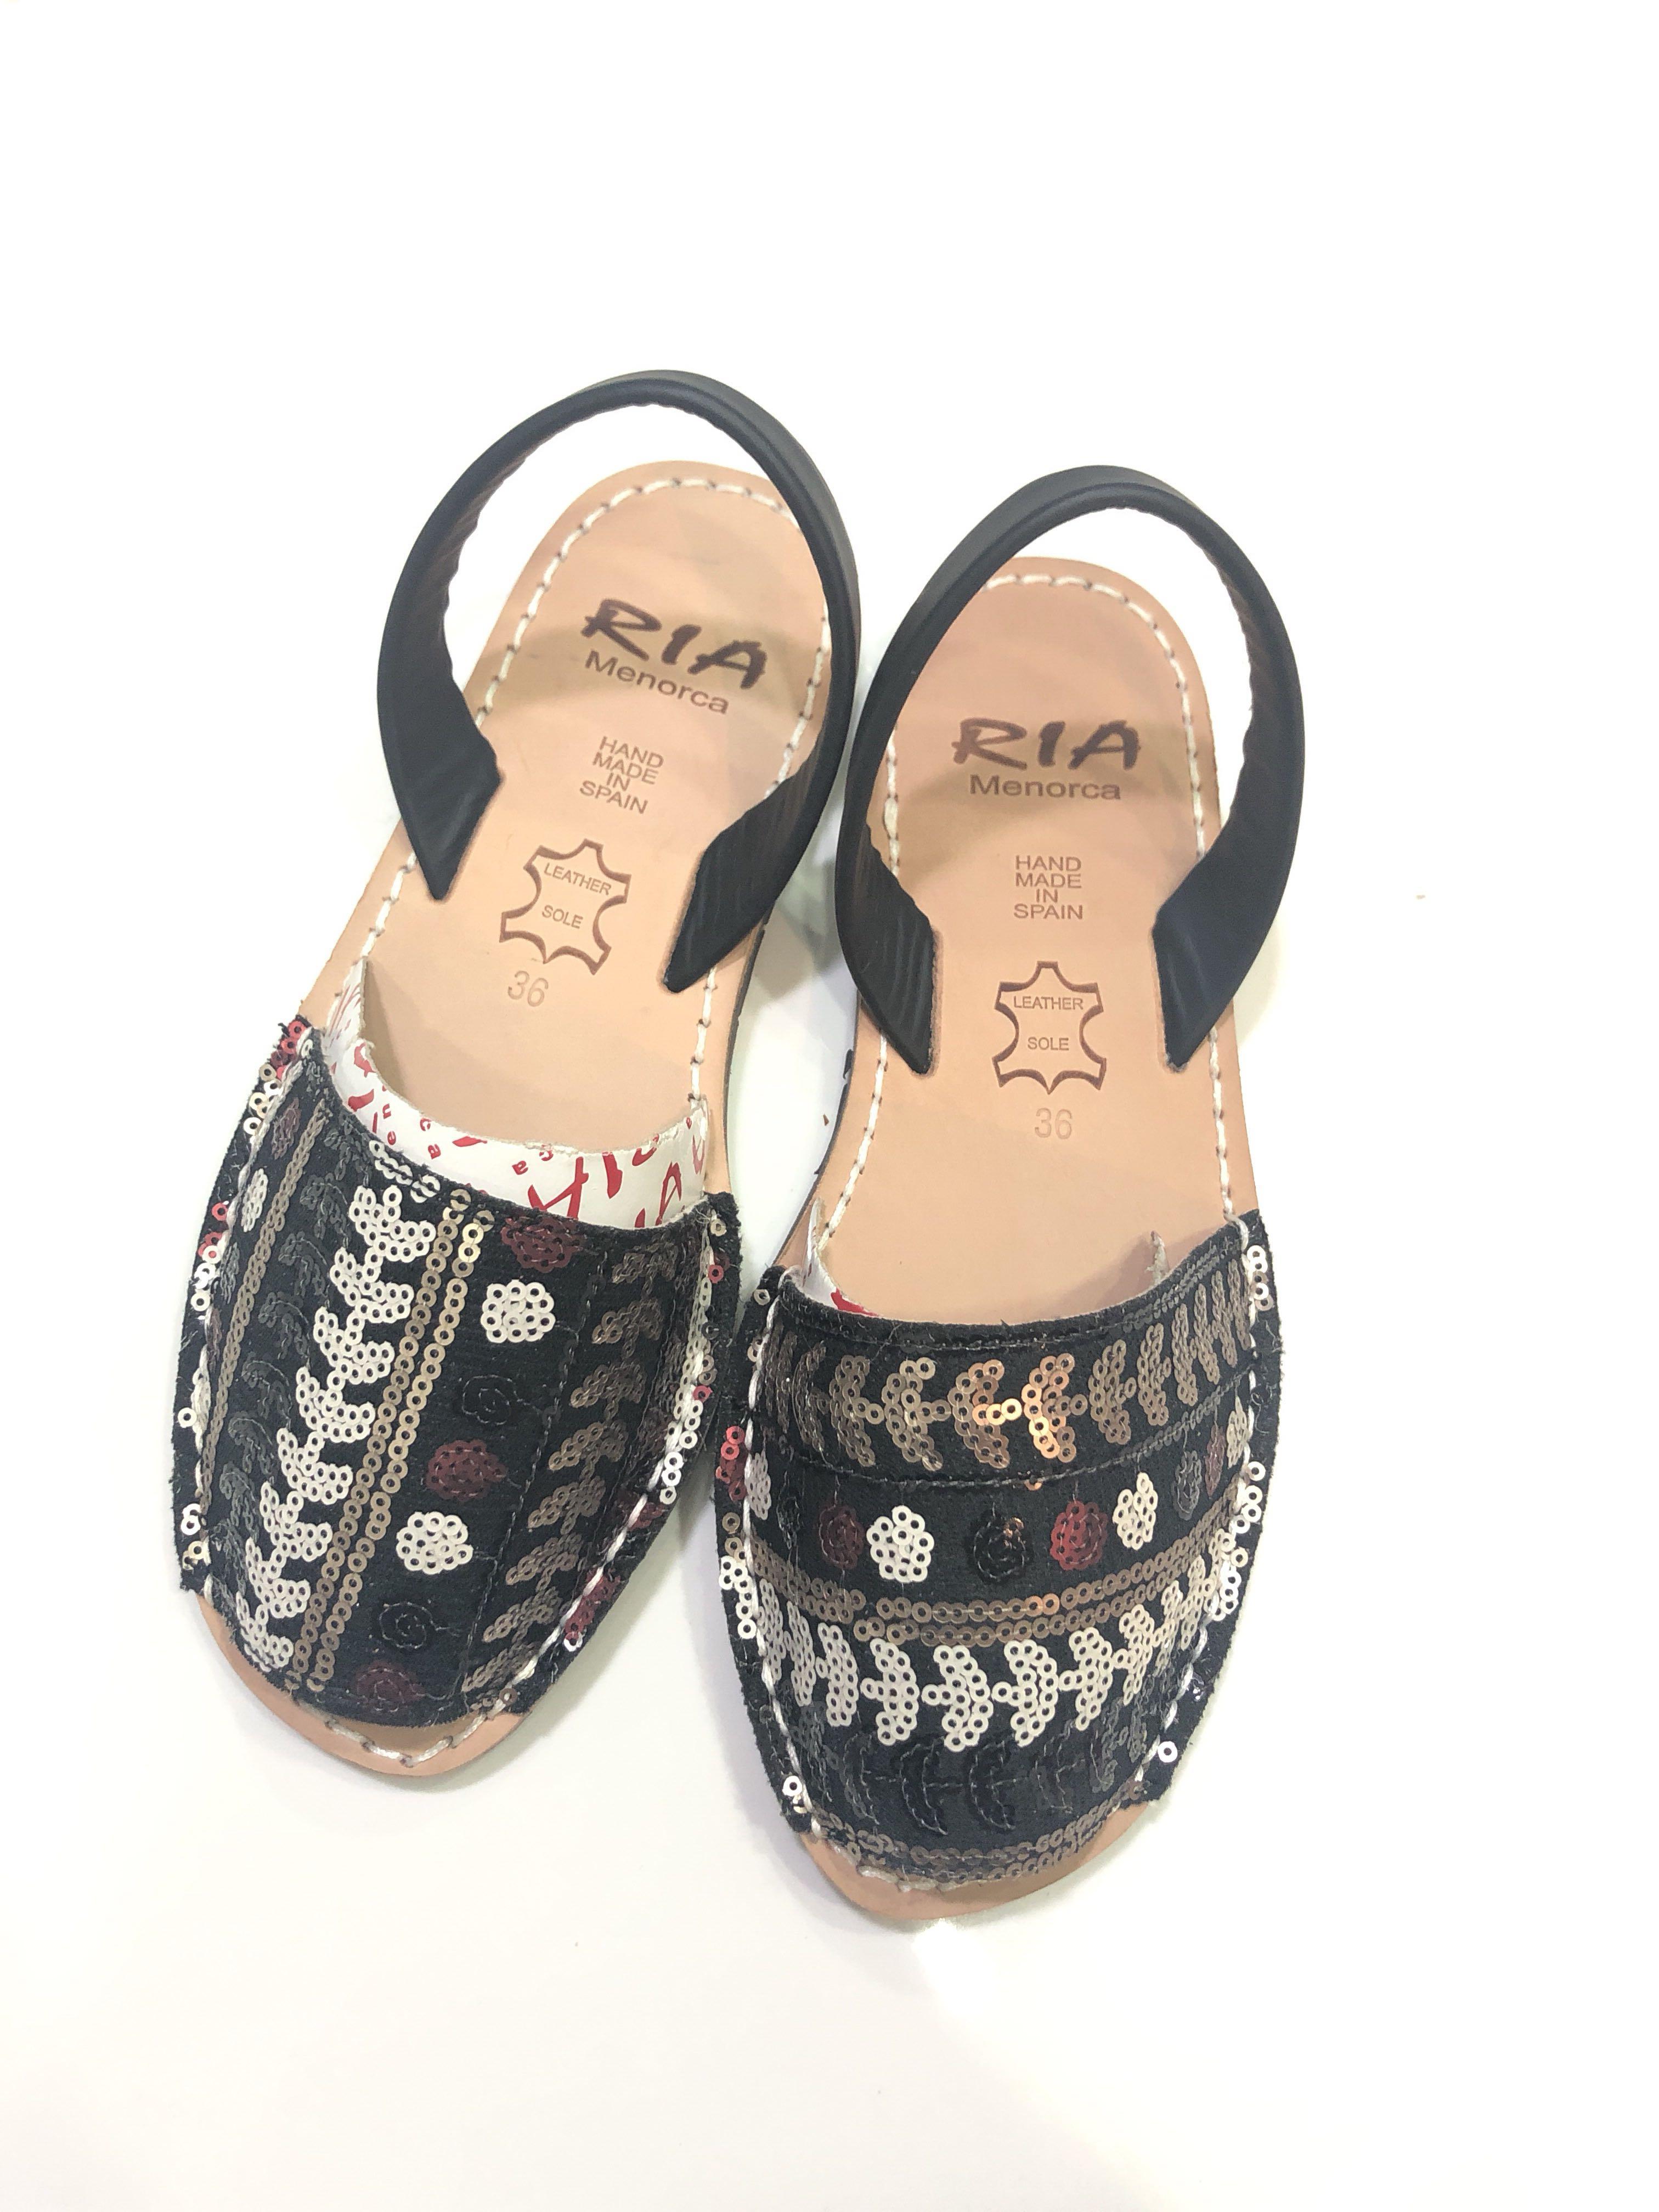 cac4a1beefc6cc Home · Women s Fashion · Shoes · Flats   Sandals. photo photo photo photo